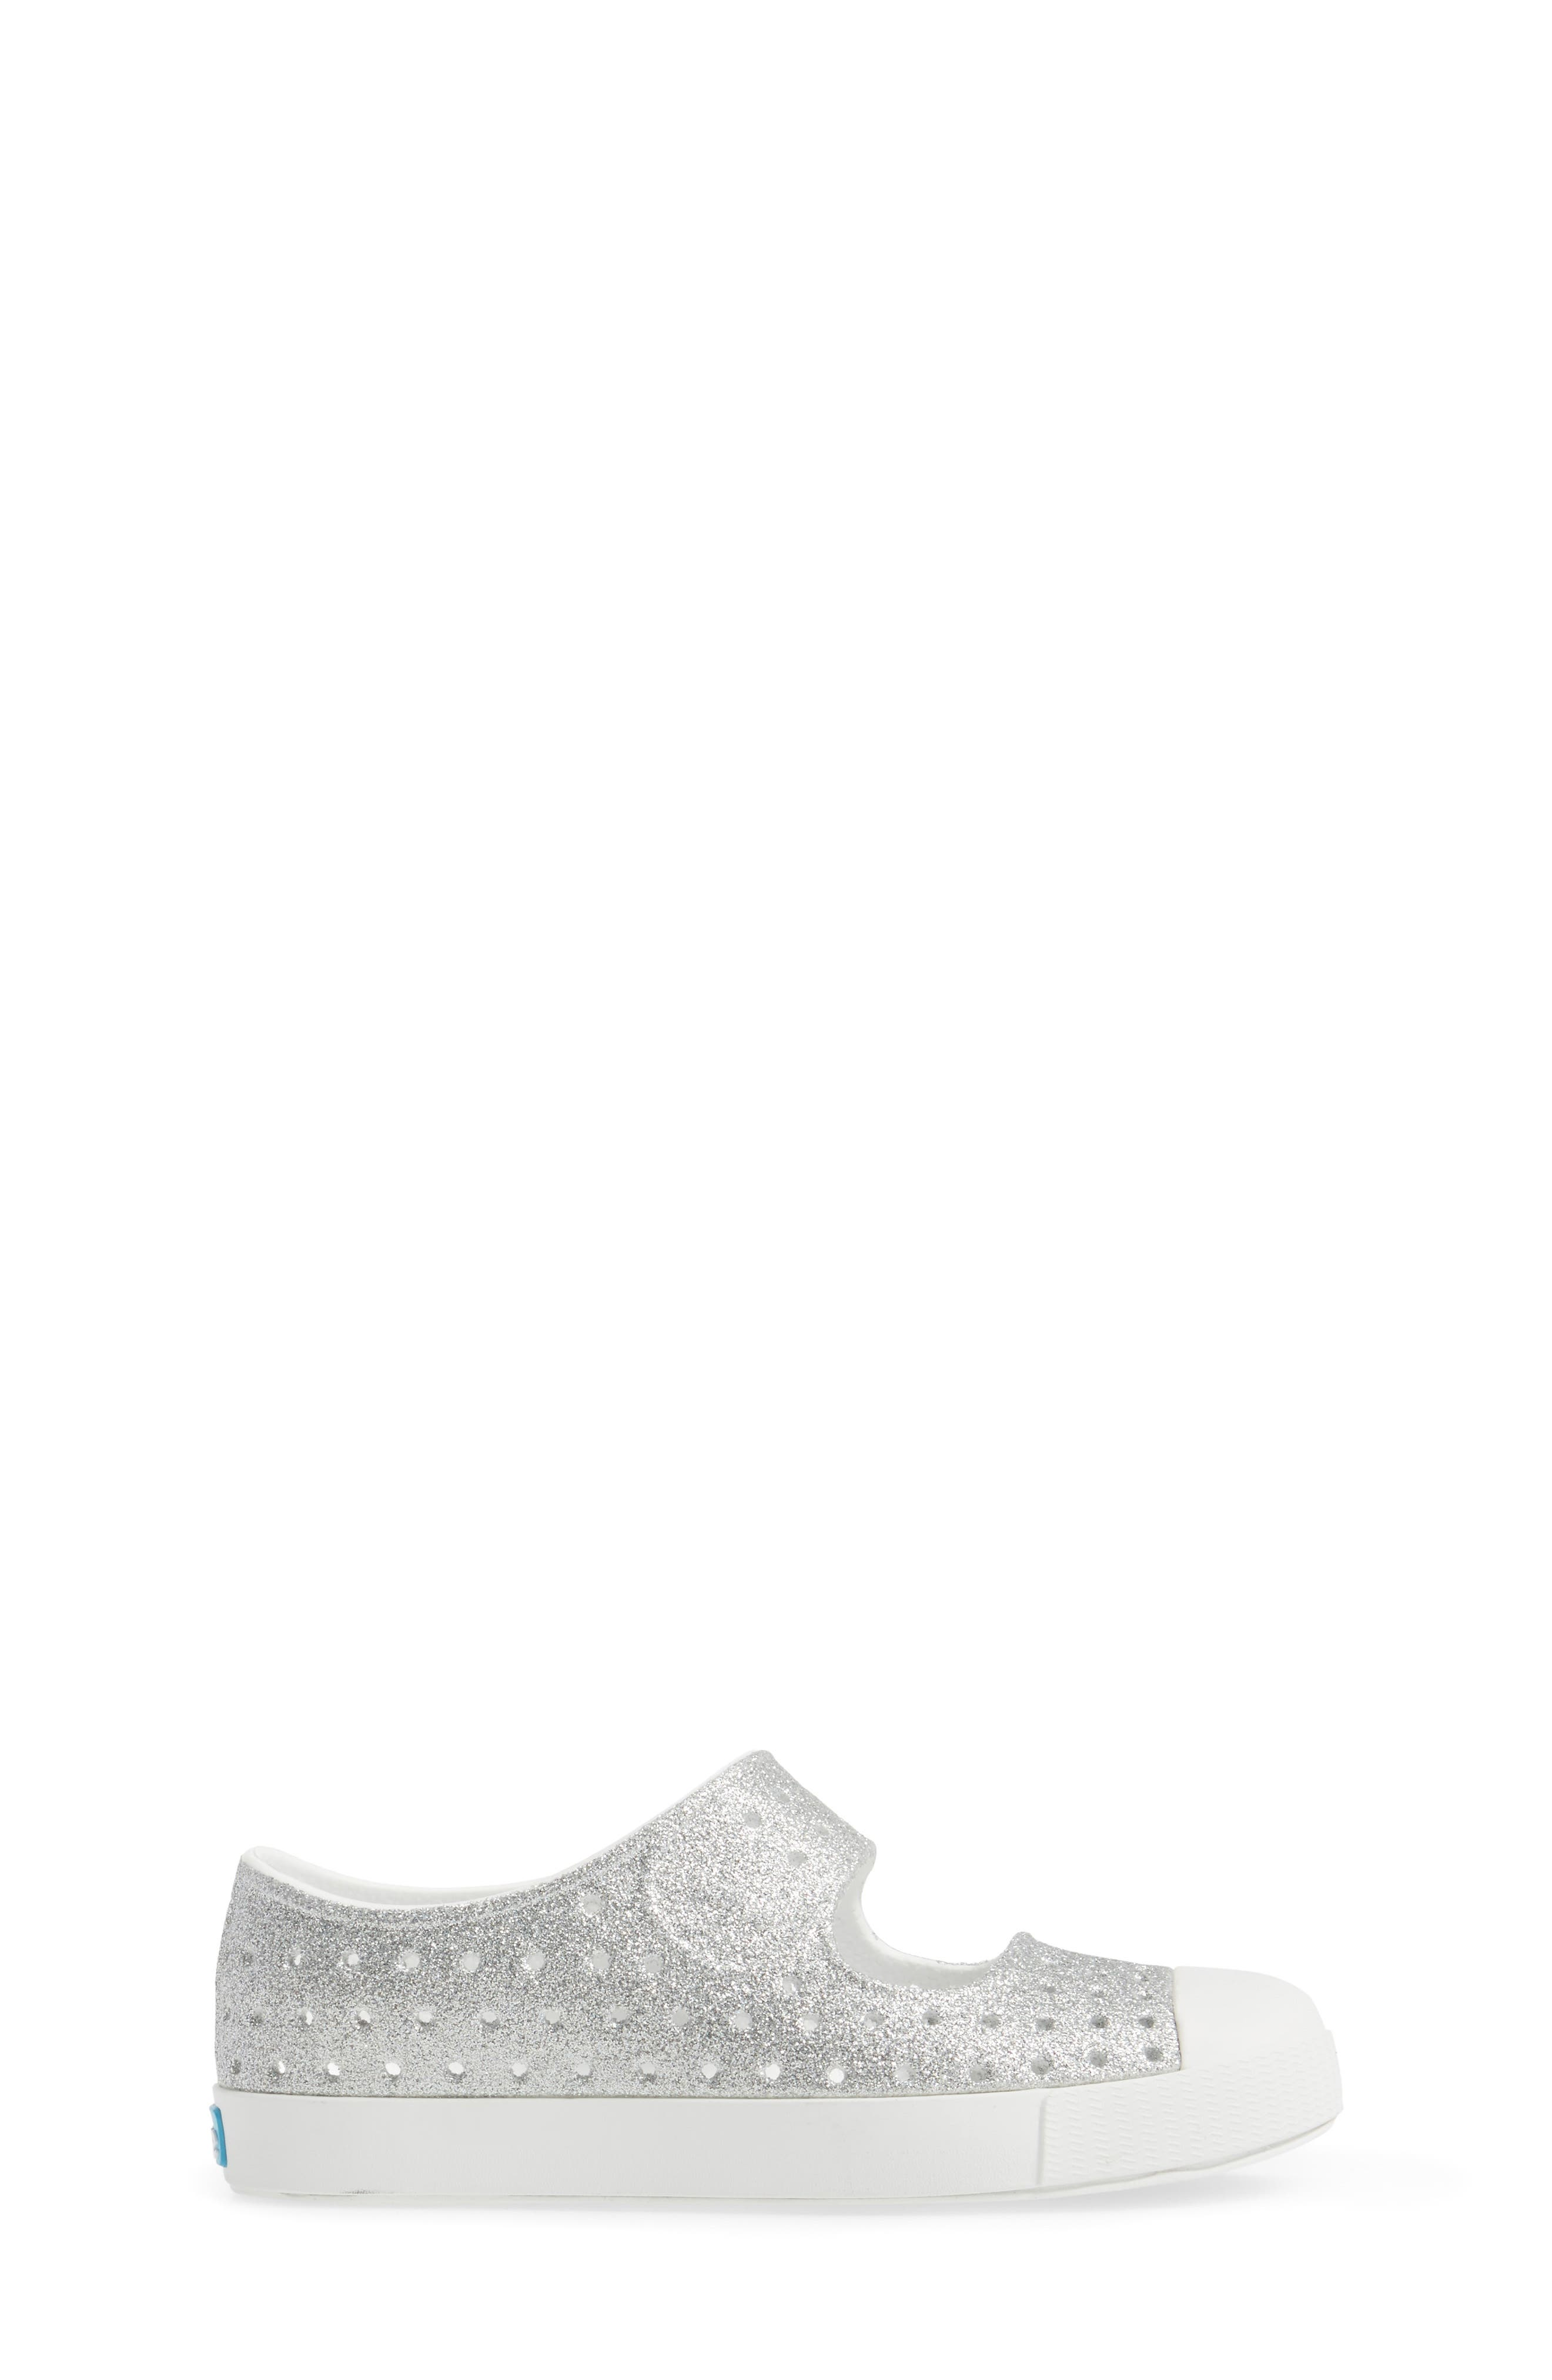 Alternate Image 3  - Native Shoes Juniper Bling Perforated Mary Jane (Baby, Walker, Toddler & Little Kid)